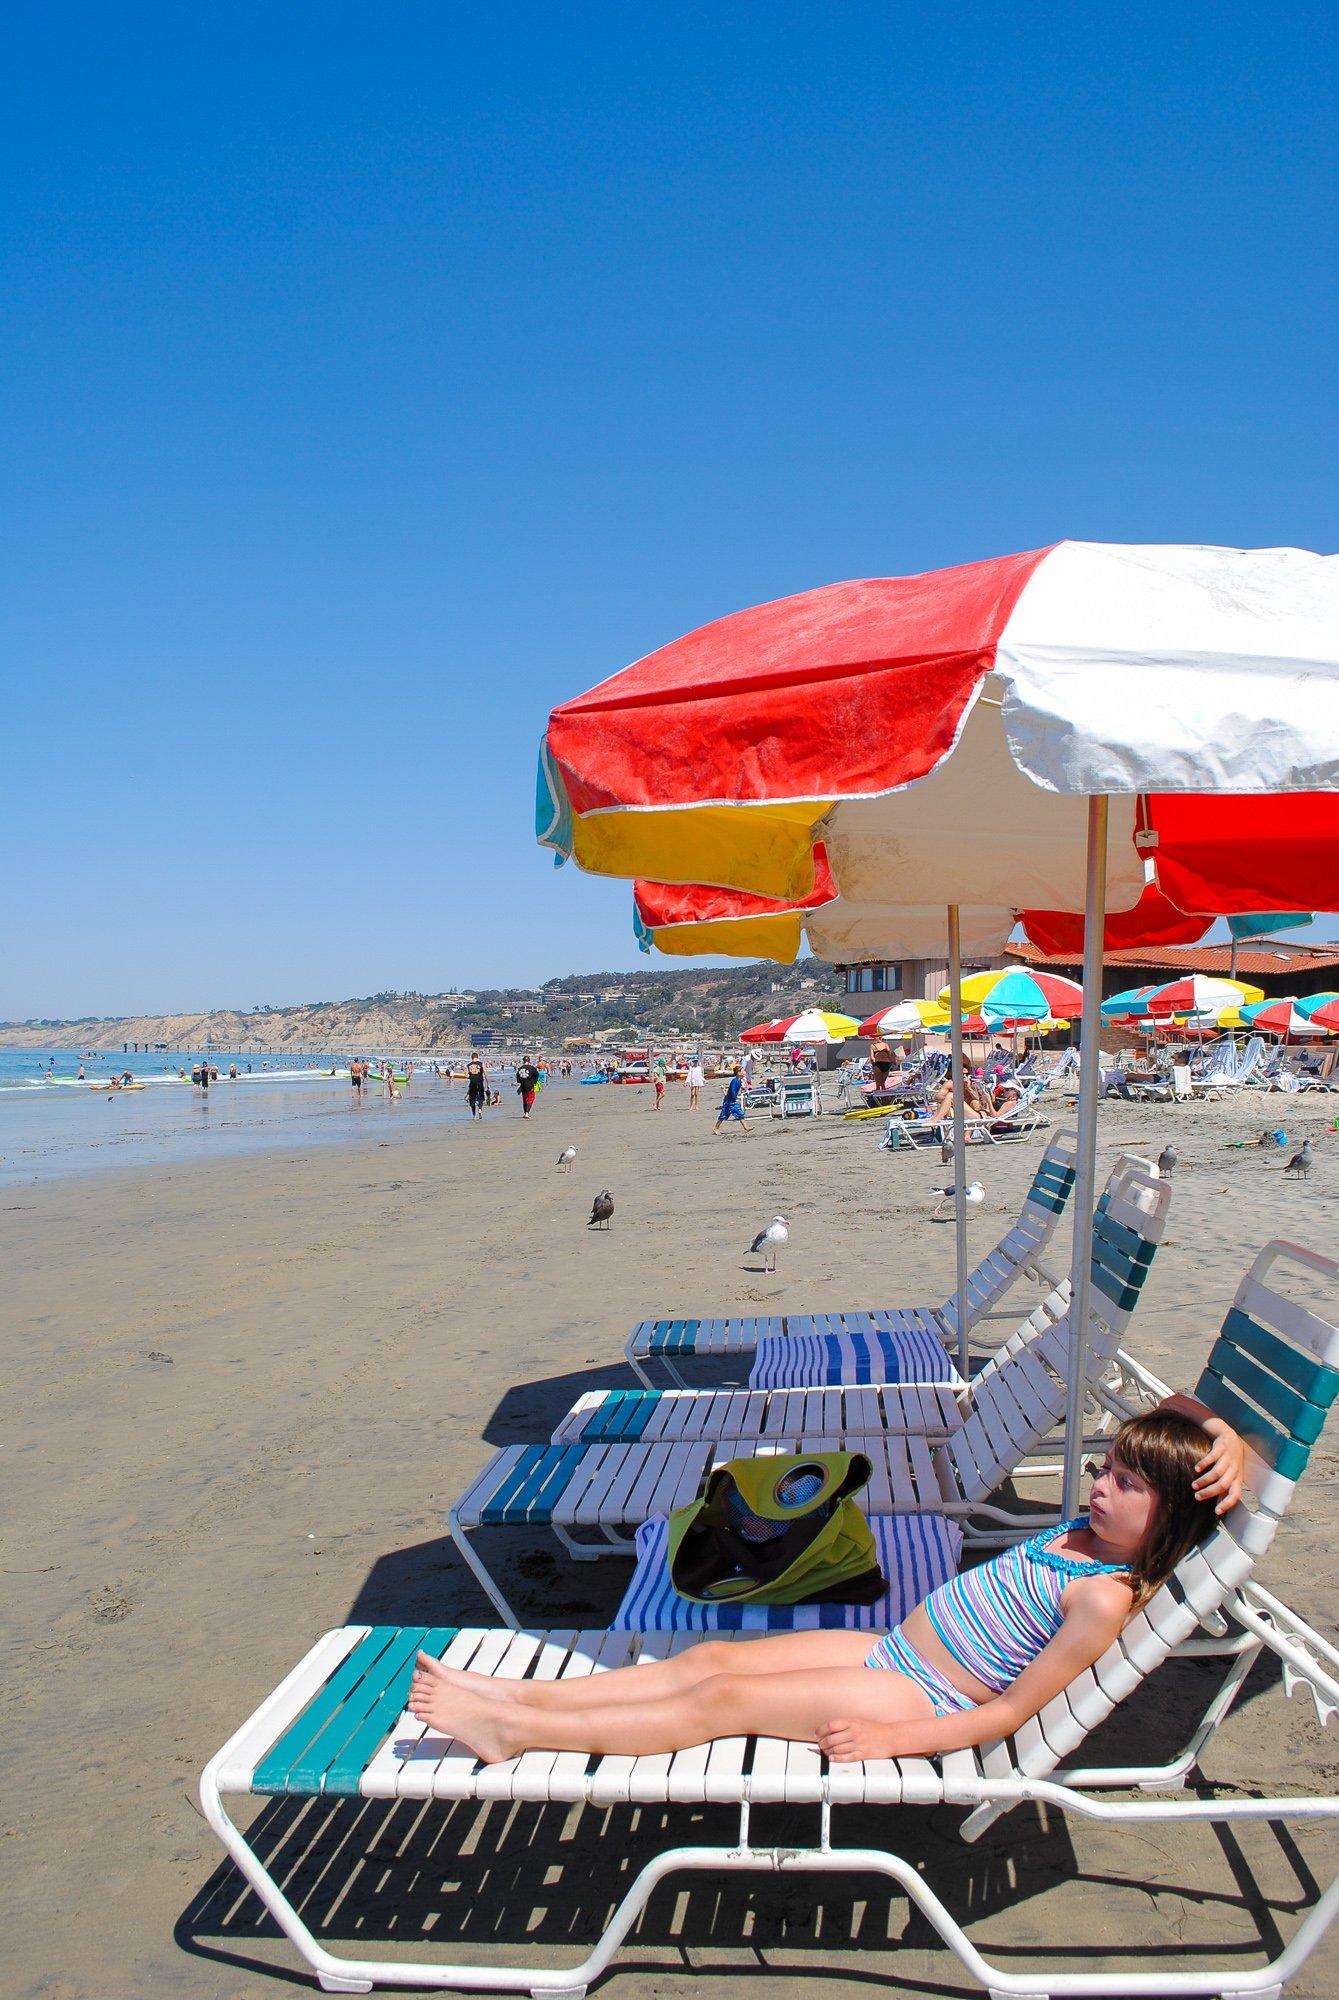 La Jolla Beach & Tennis Club in La Jolla, California is one of the most kid-friendly hotels in San Diego County